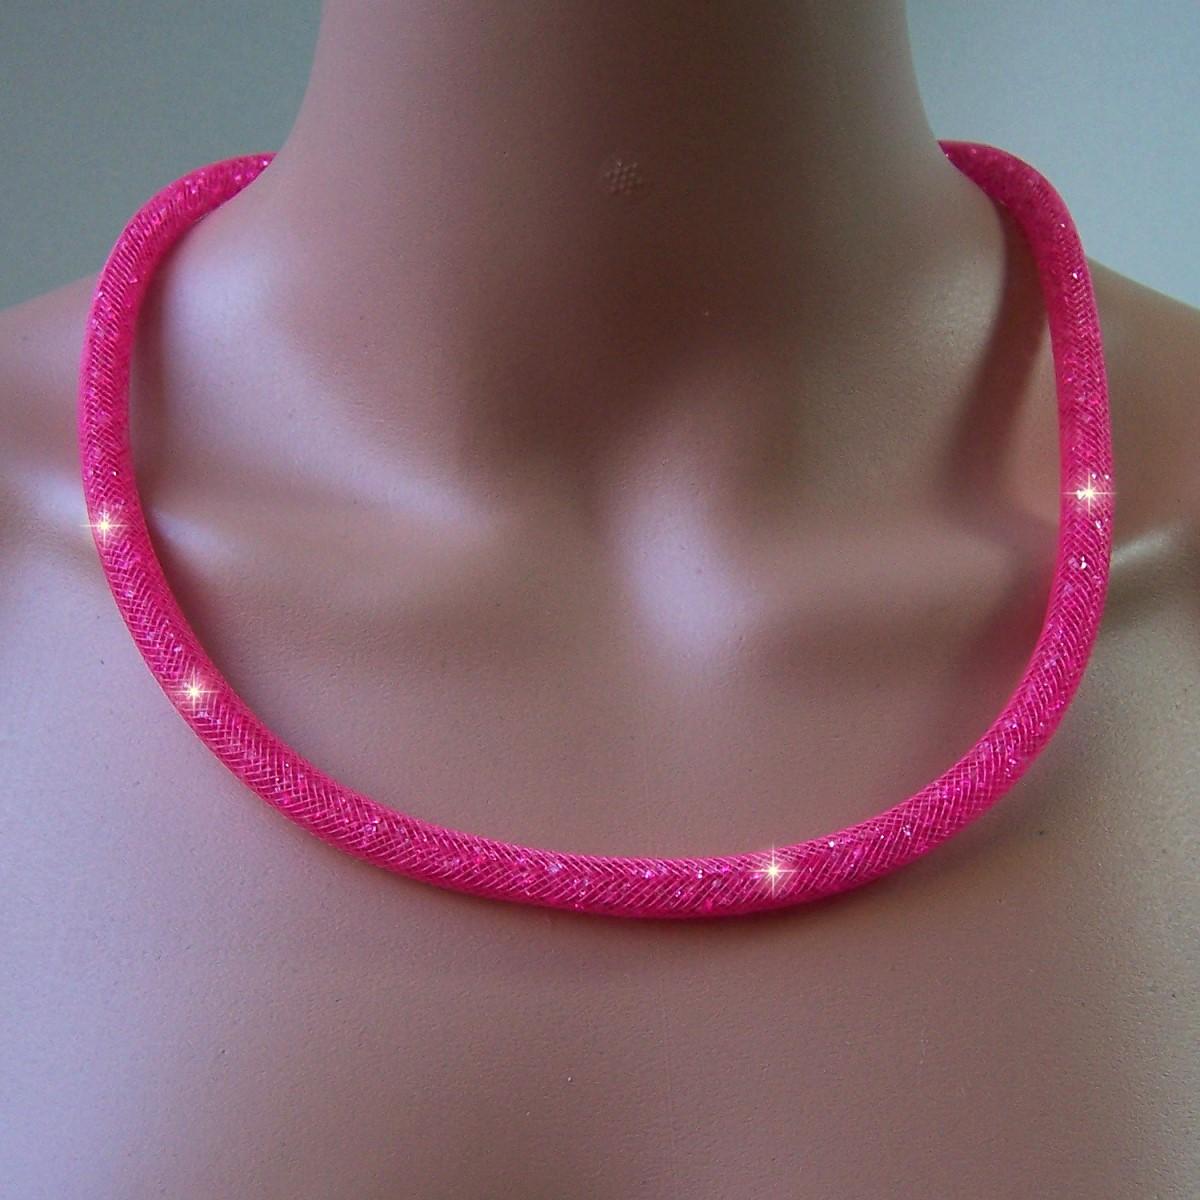 K897# Collier 58cm lang Strasskristalle pink in 3D-Netzschlauch